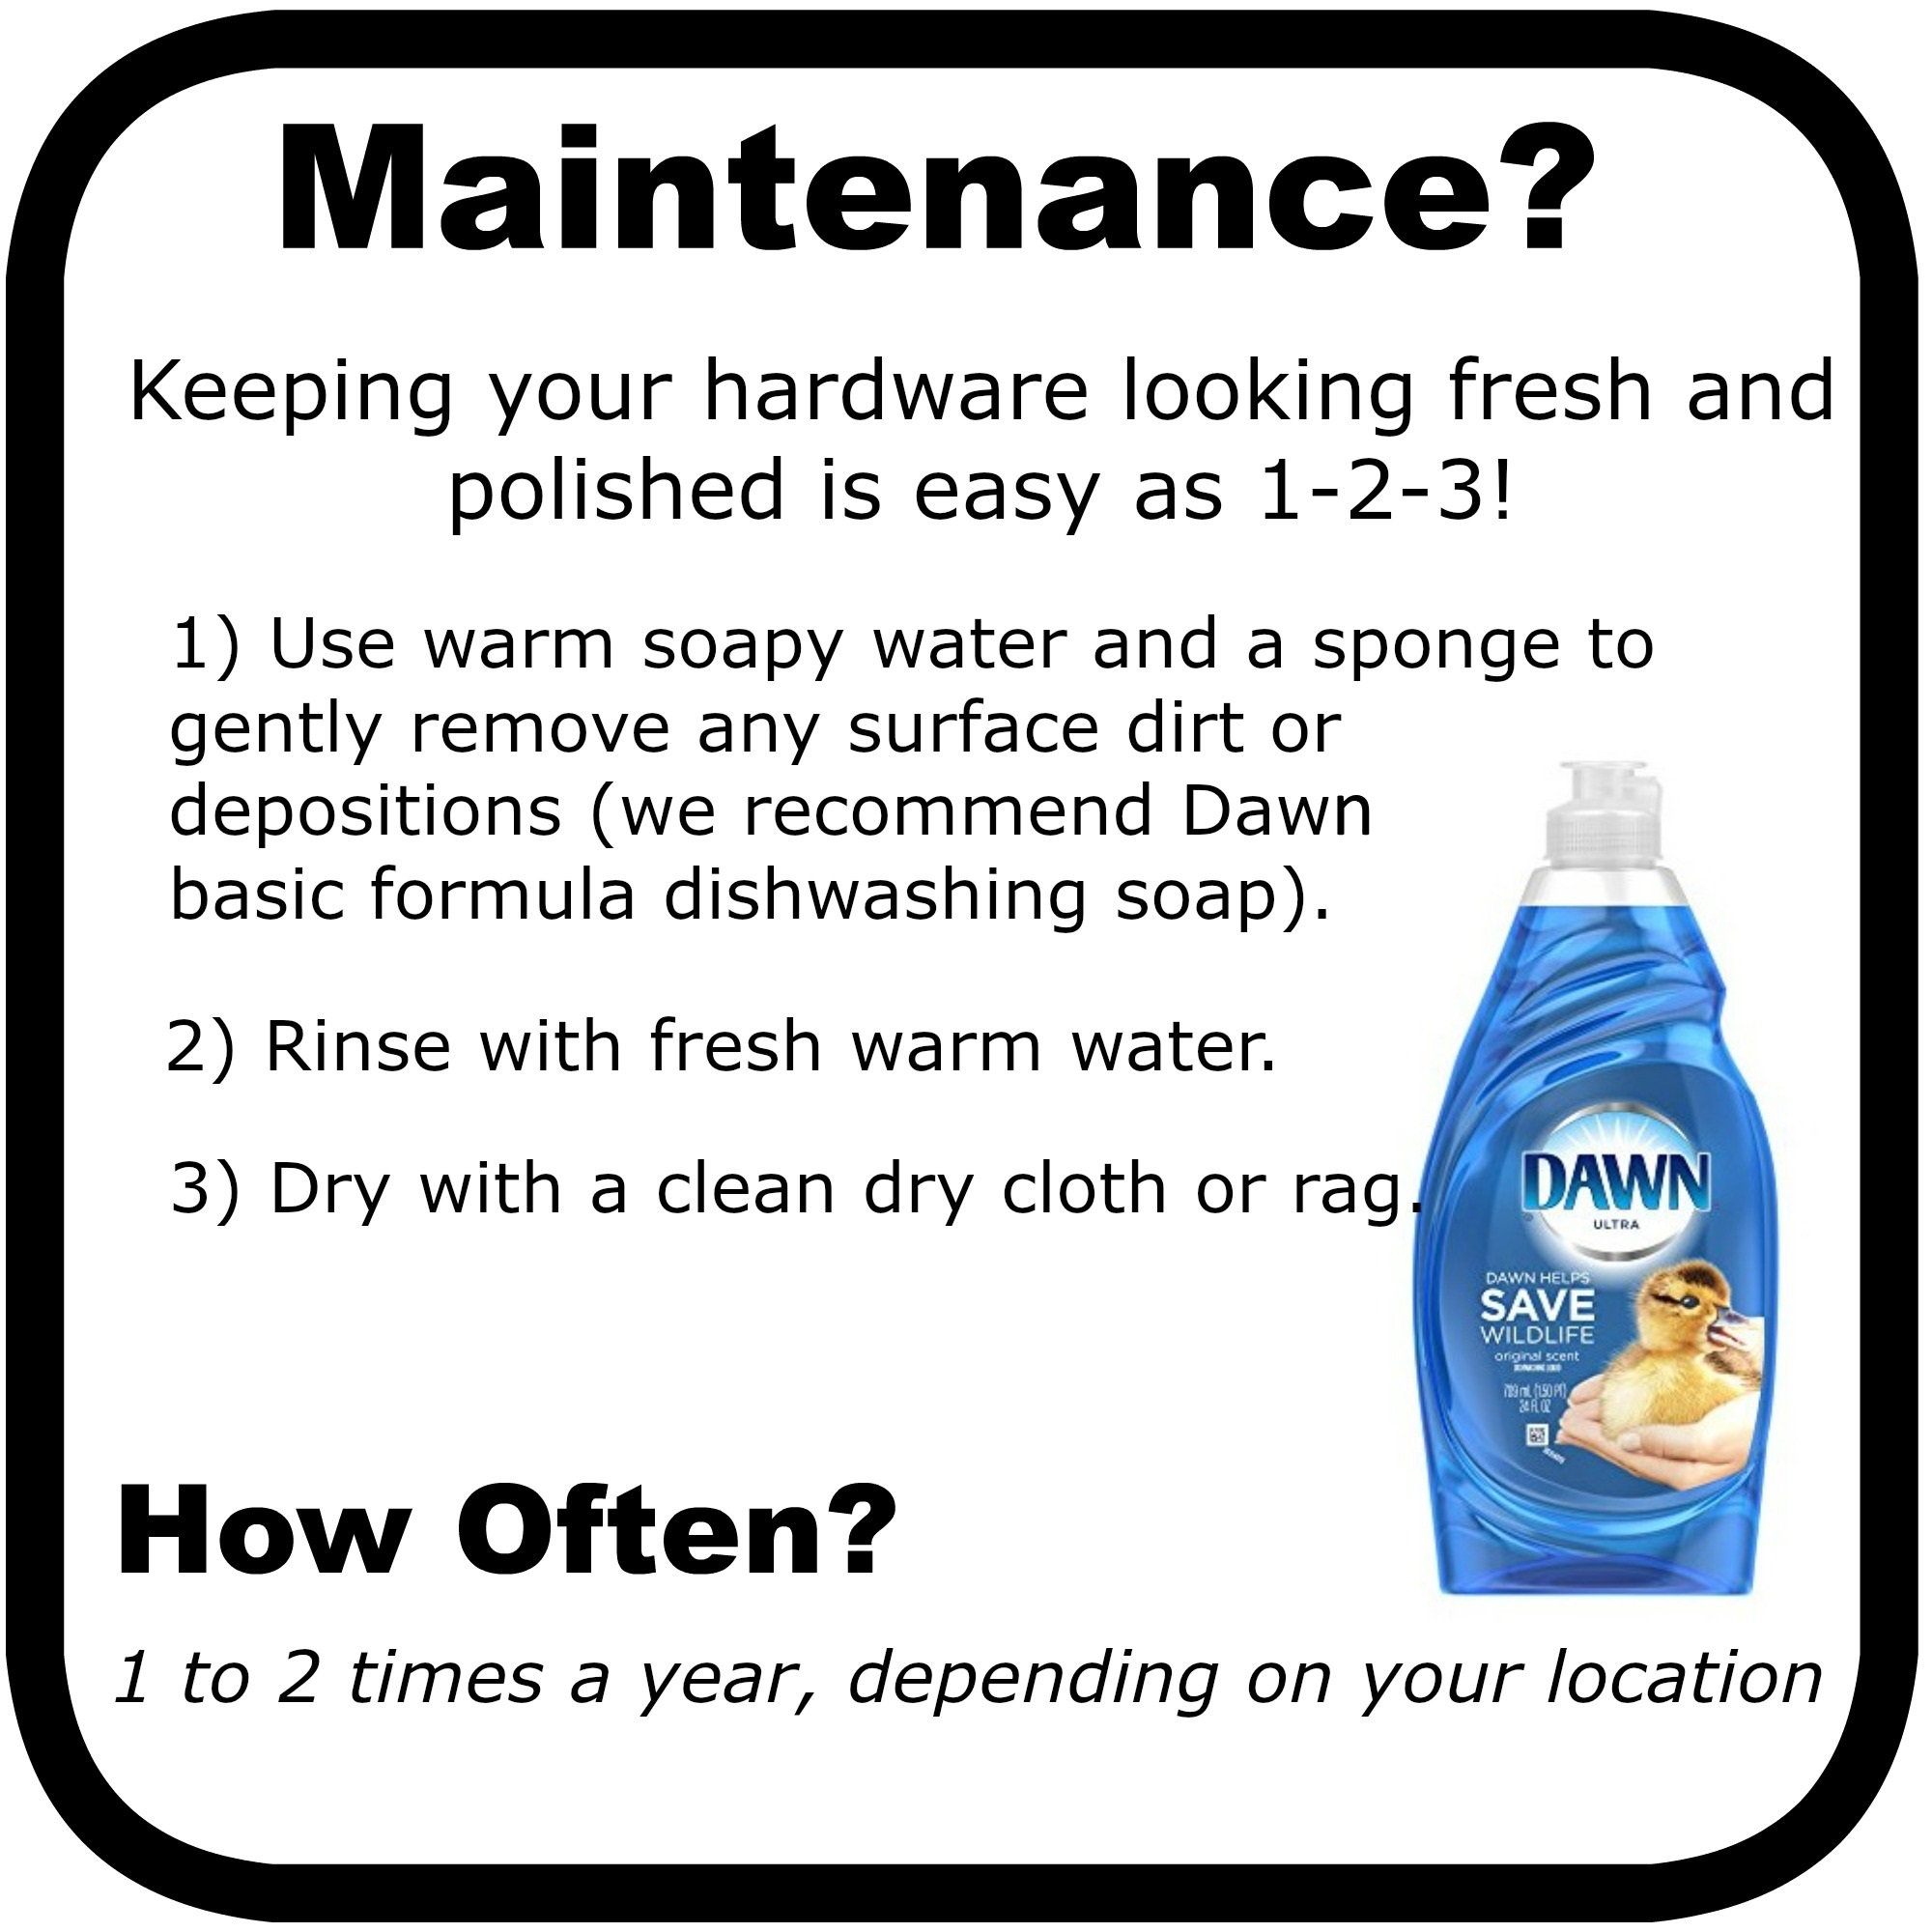 maintenance-instructions.jpg